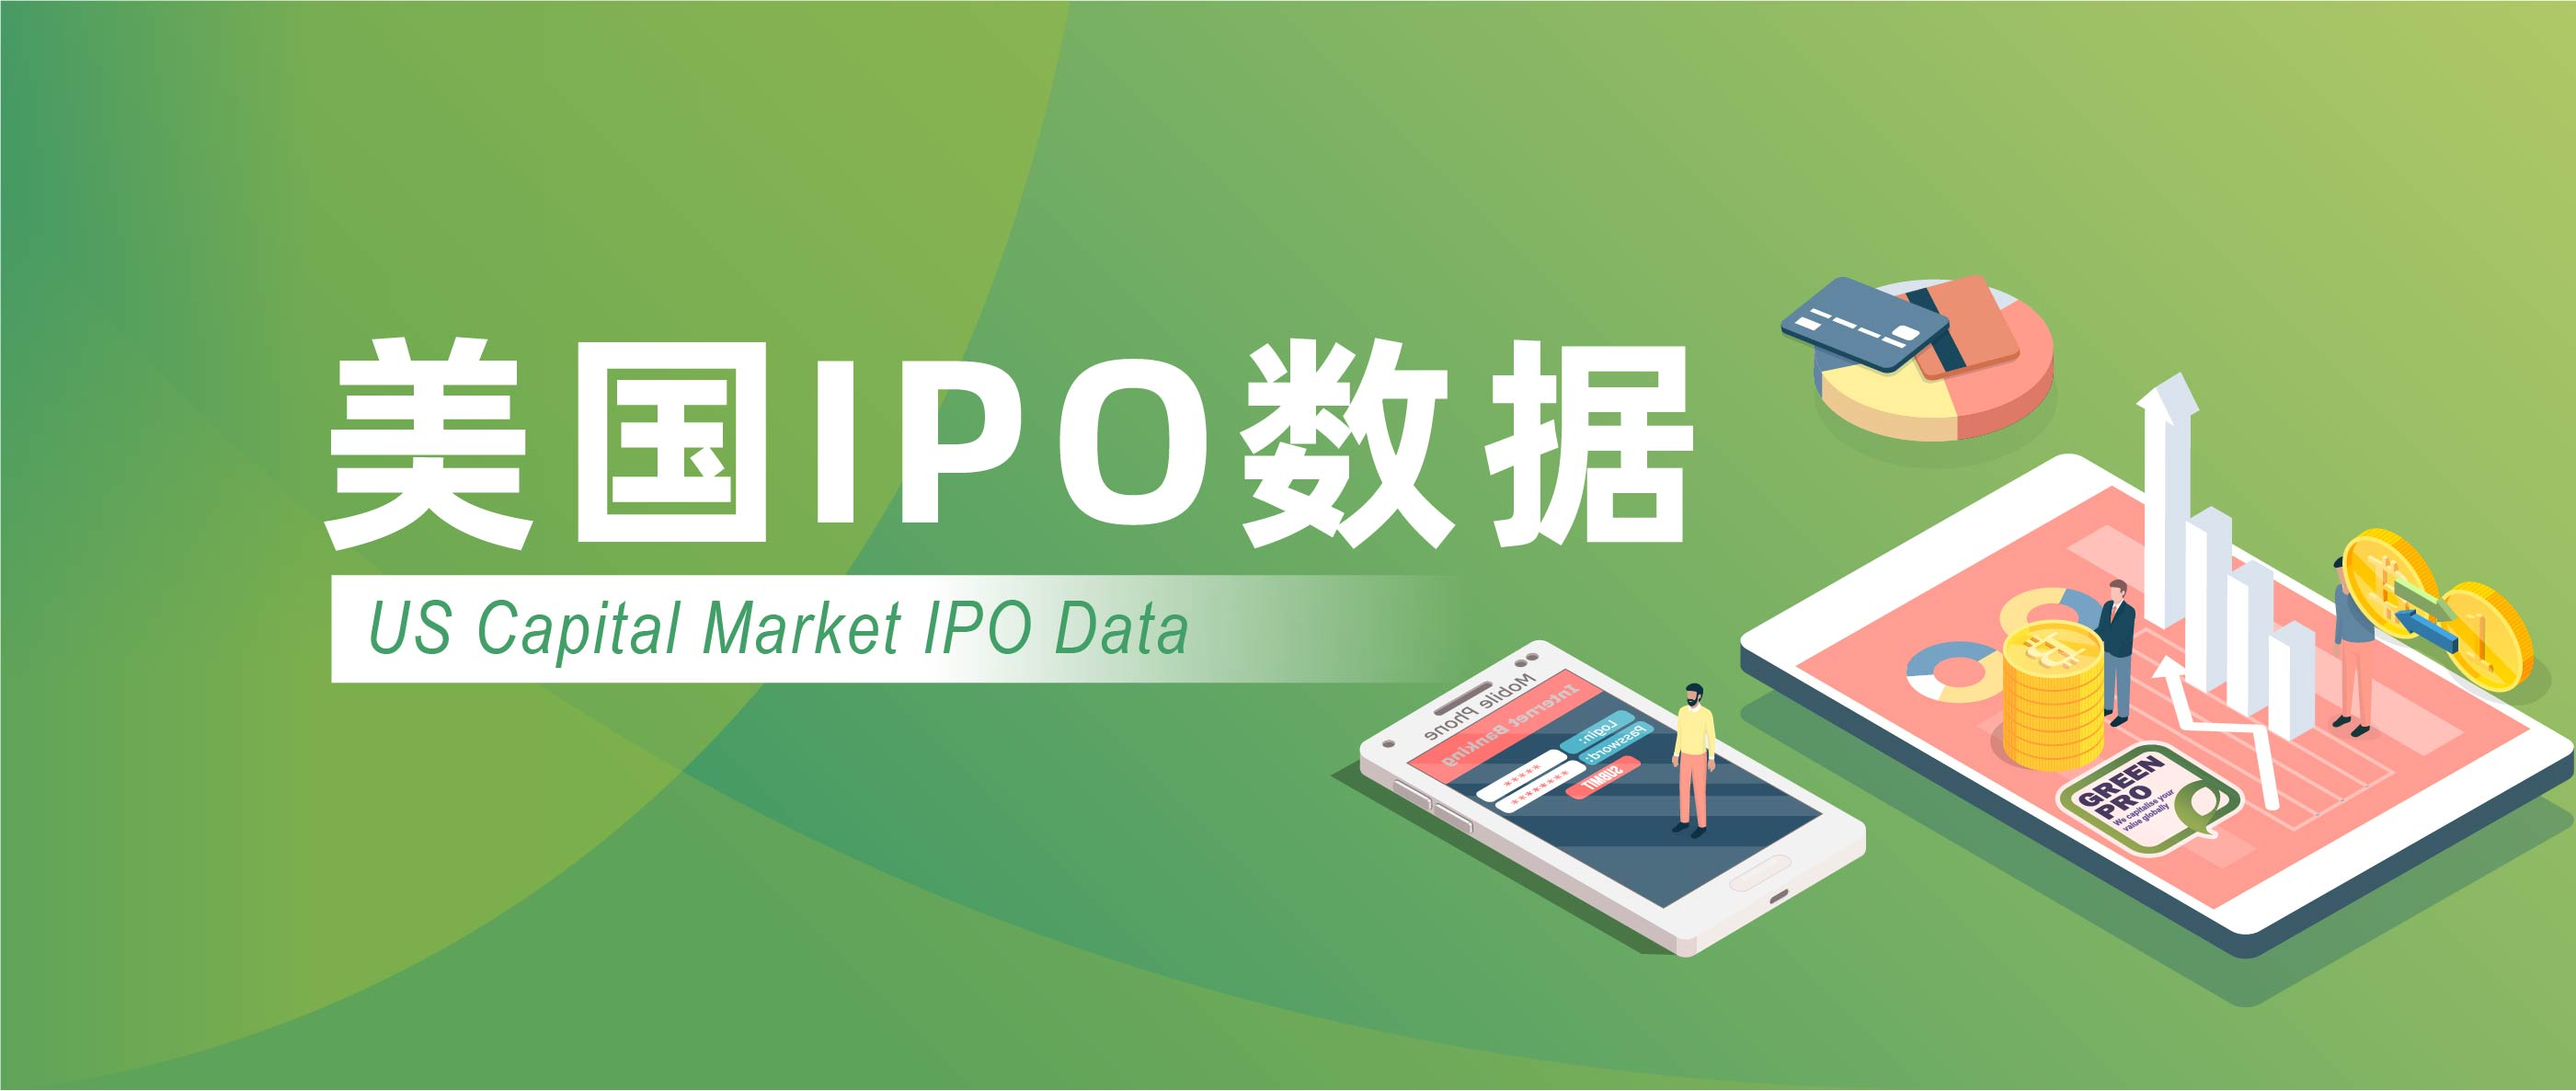 et41842041000131 - 2021年2月中企赴美IPO回顾:6家企业募资6.4亿美元-海外上市